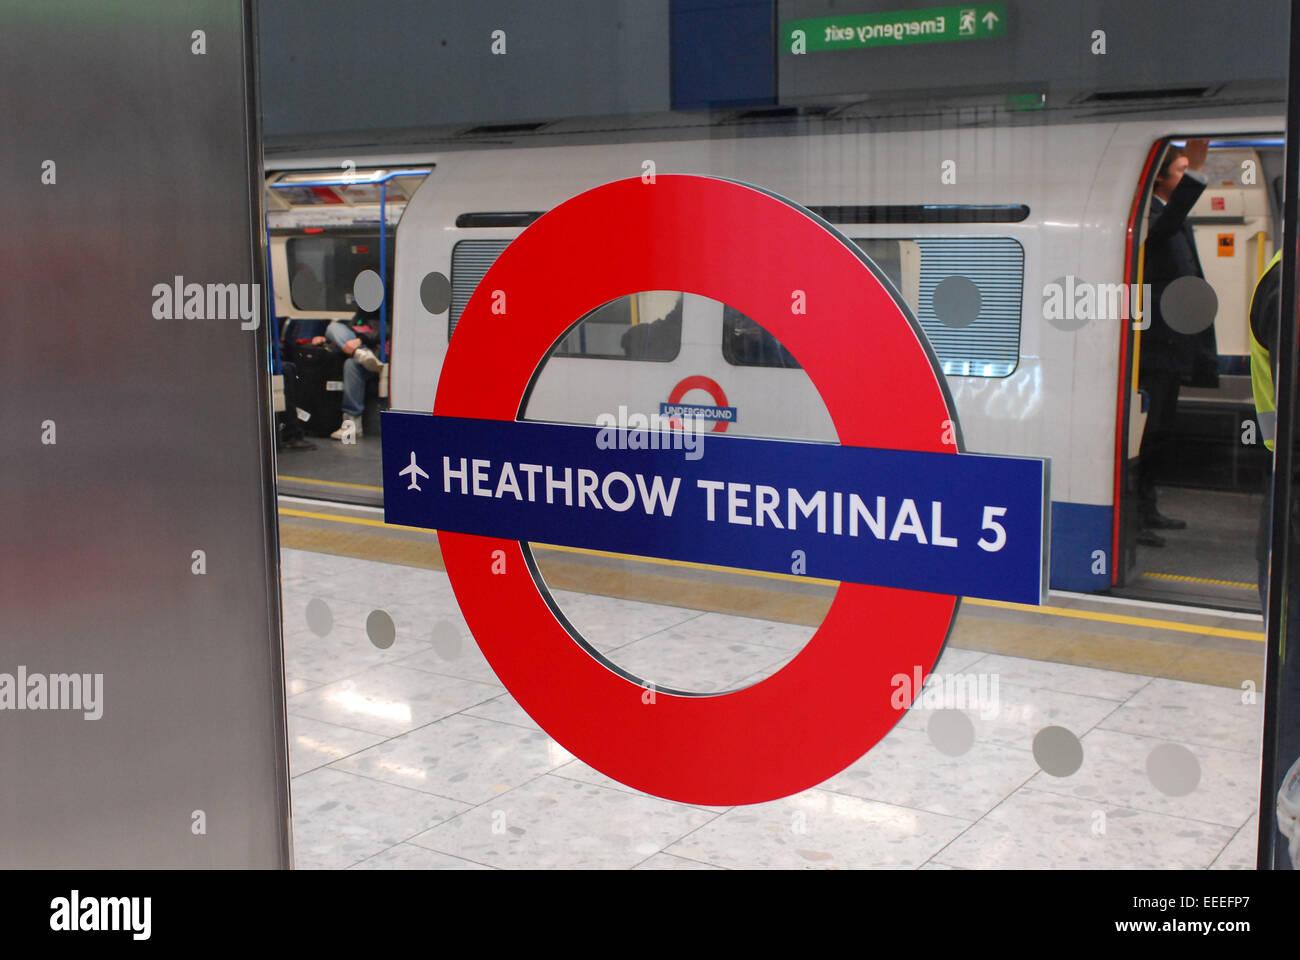 Station roundel at Heathrow Terminal 5 Underground station - Stock Image